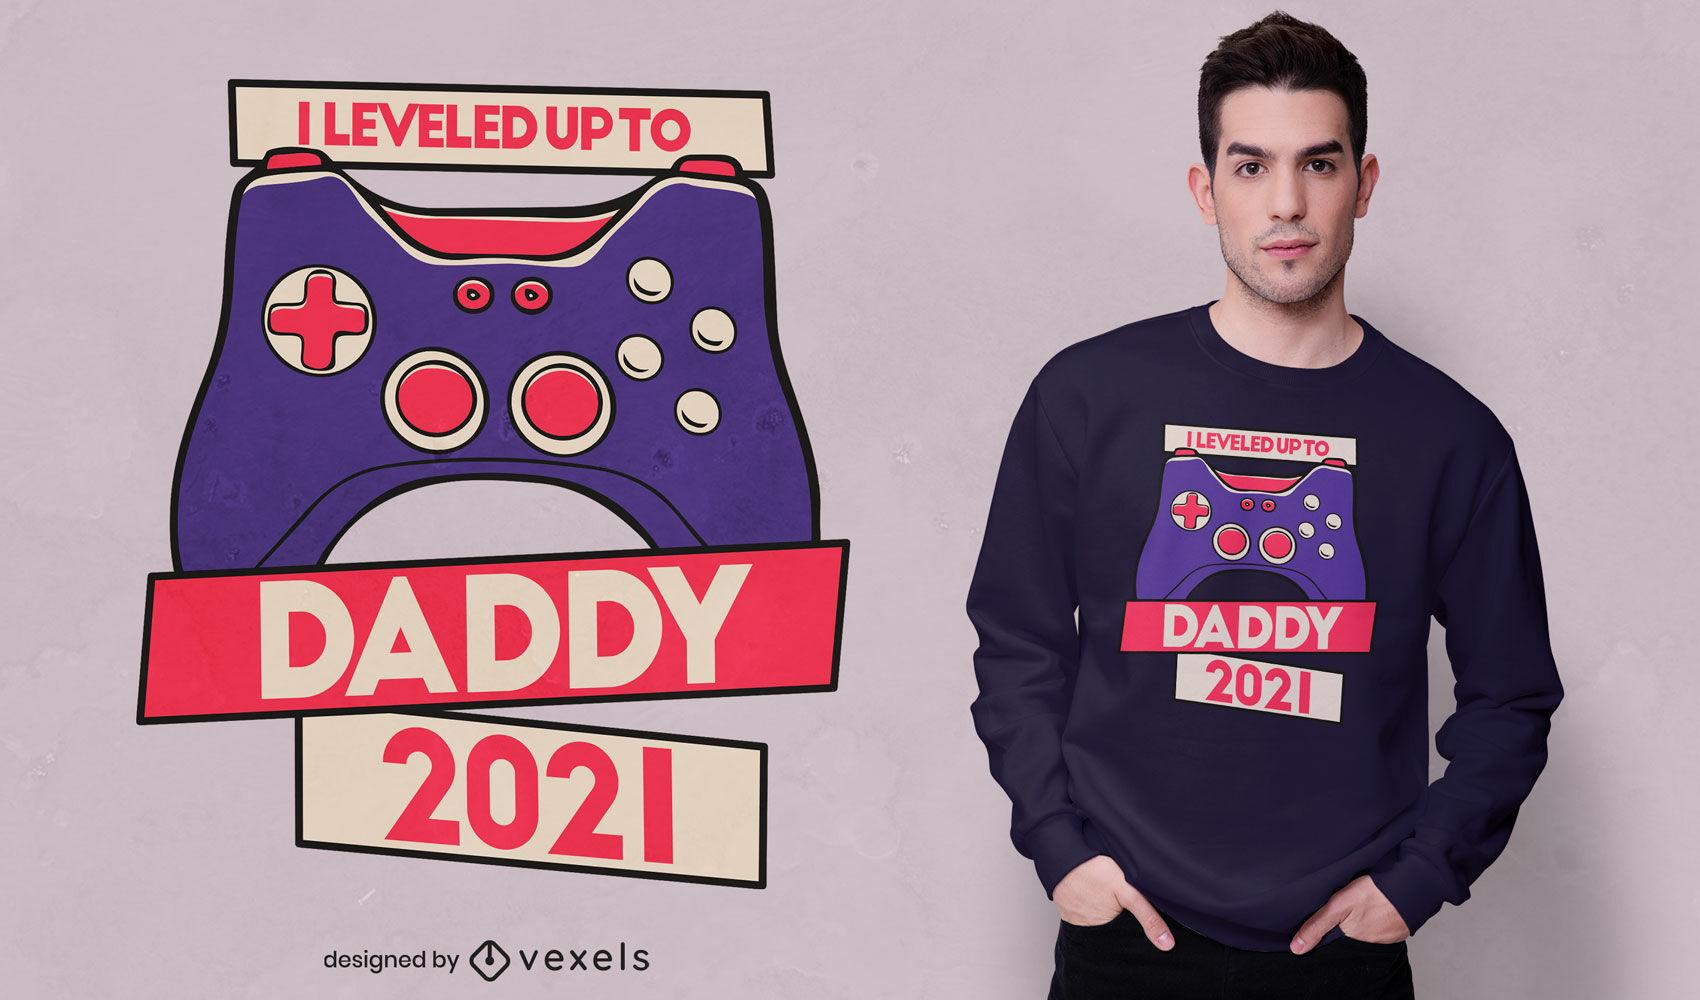 Gamer level up joystick t-shirt design